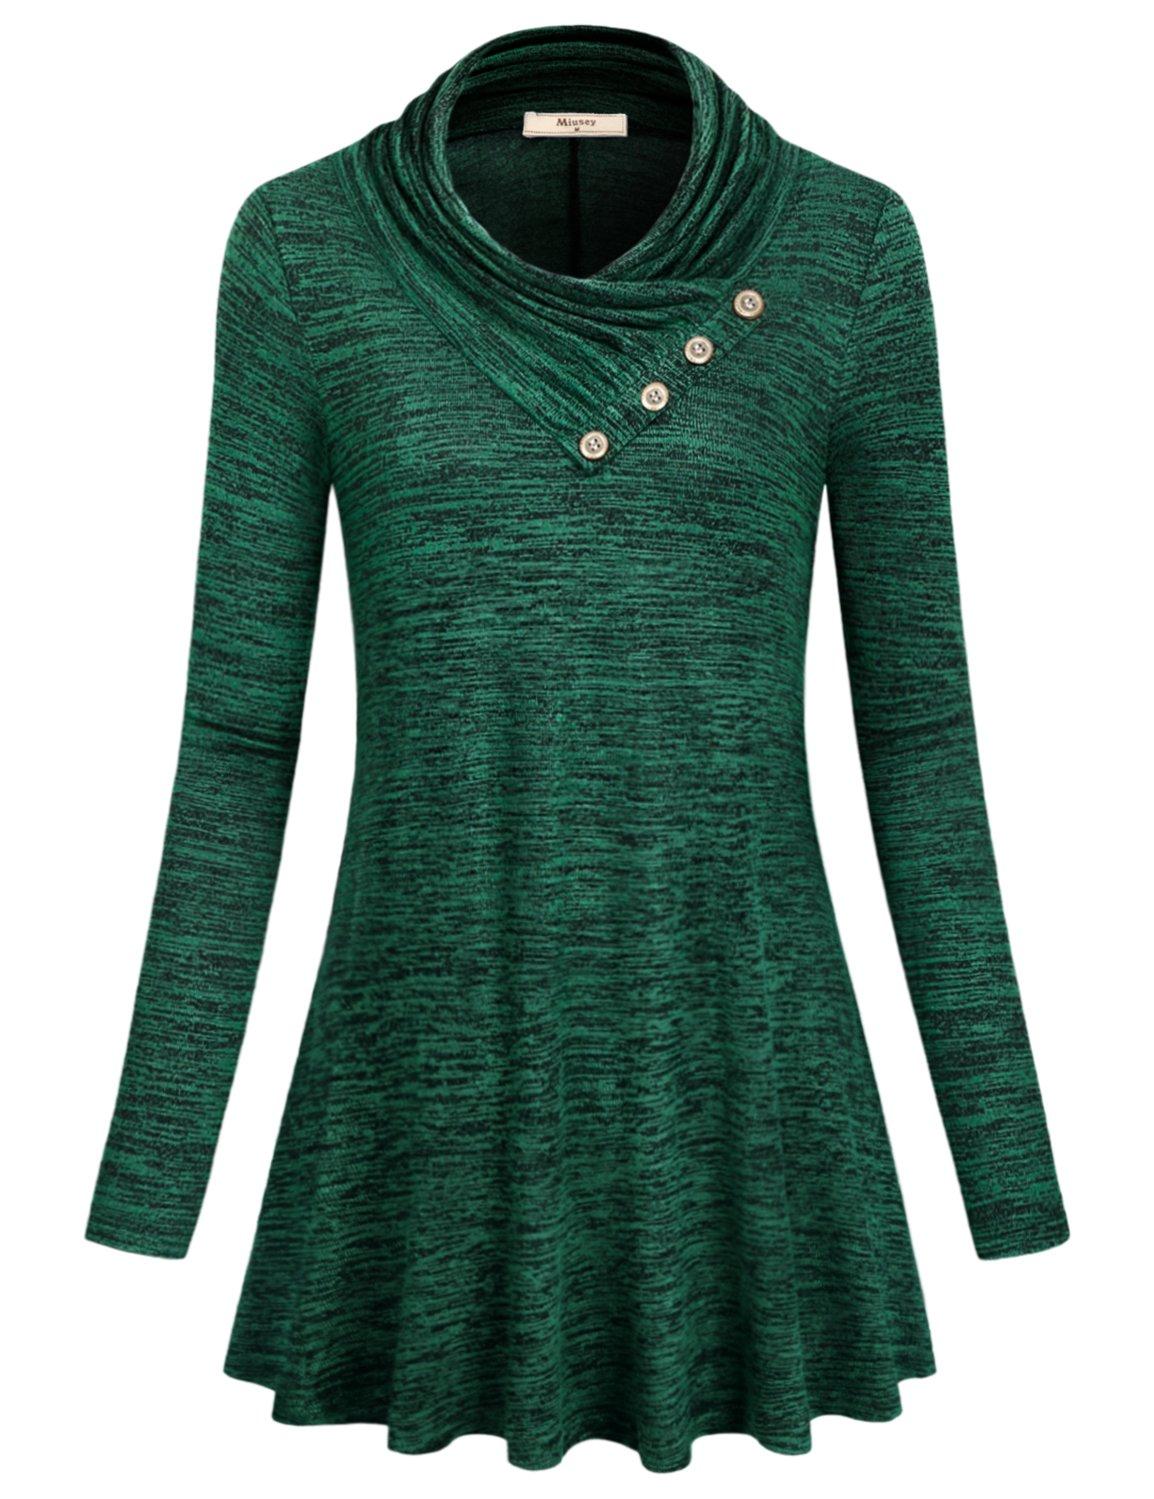 Miusey Mom Swearshirt, Womens Fashion 2018 Shirt Turtle Neck A line Flowy Vintage Surrounding Cowl Neck Full Length Daily Wear Cute Outfit Trendy Fashion Jersey Sweatshirt Green XL